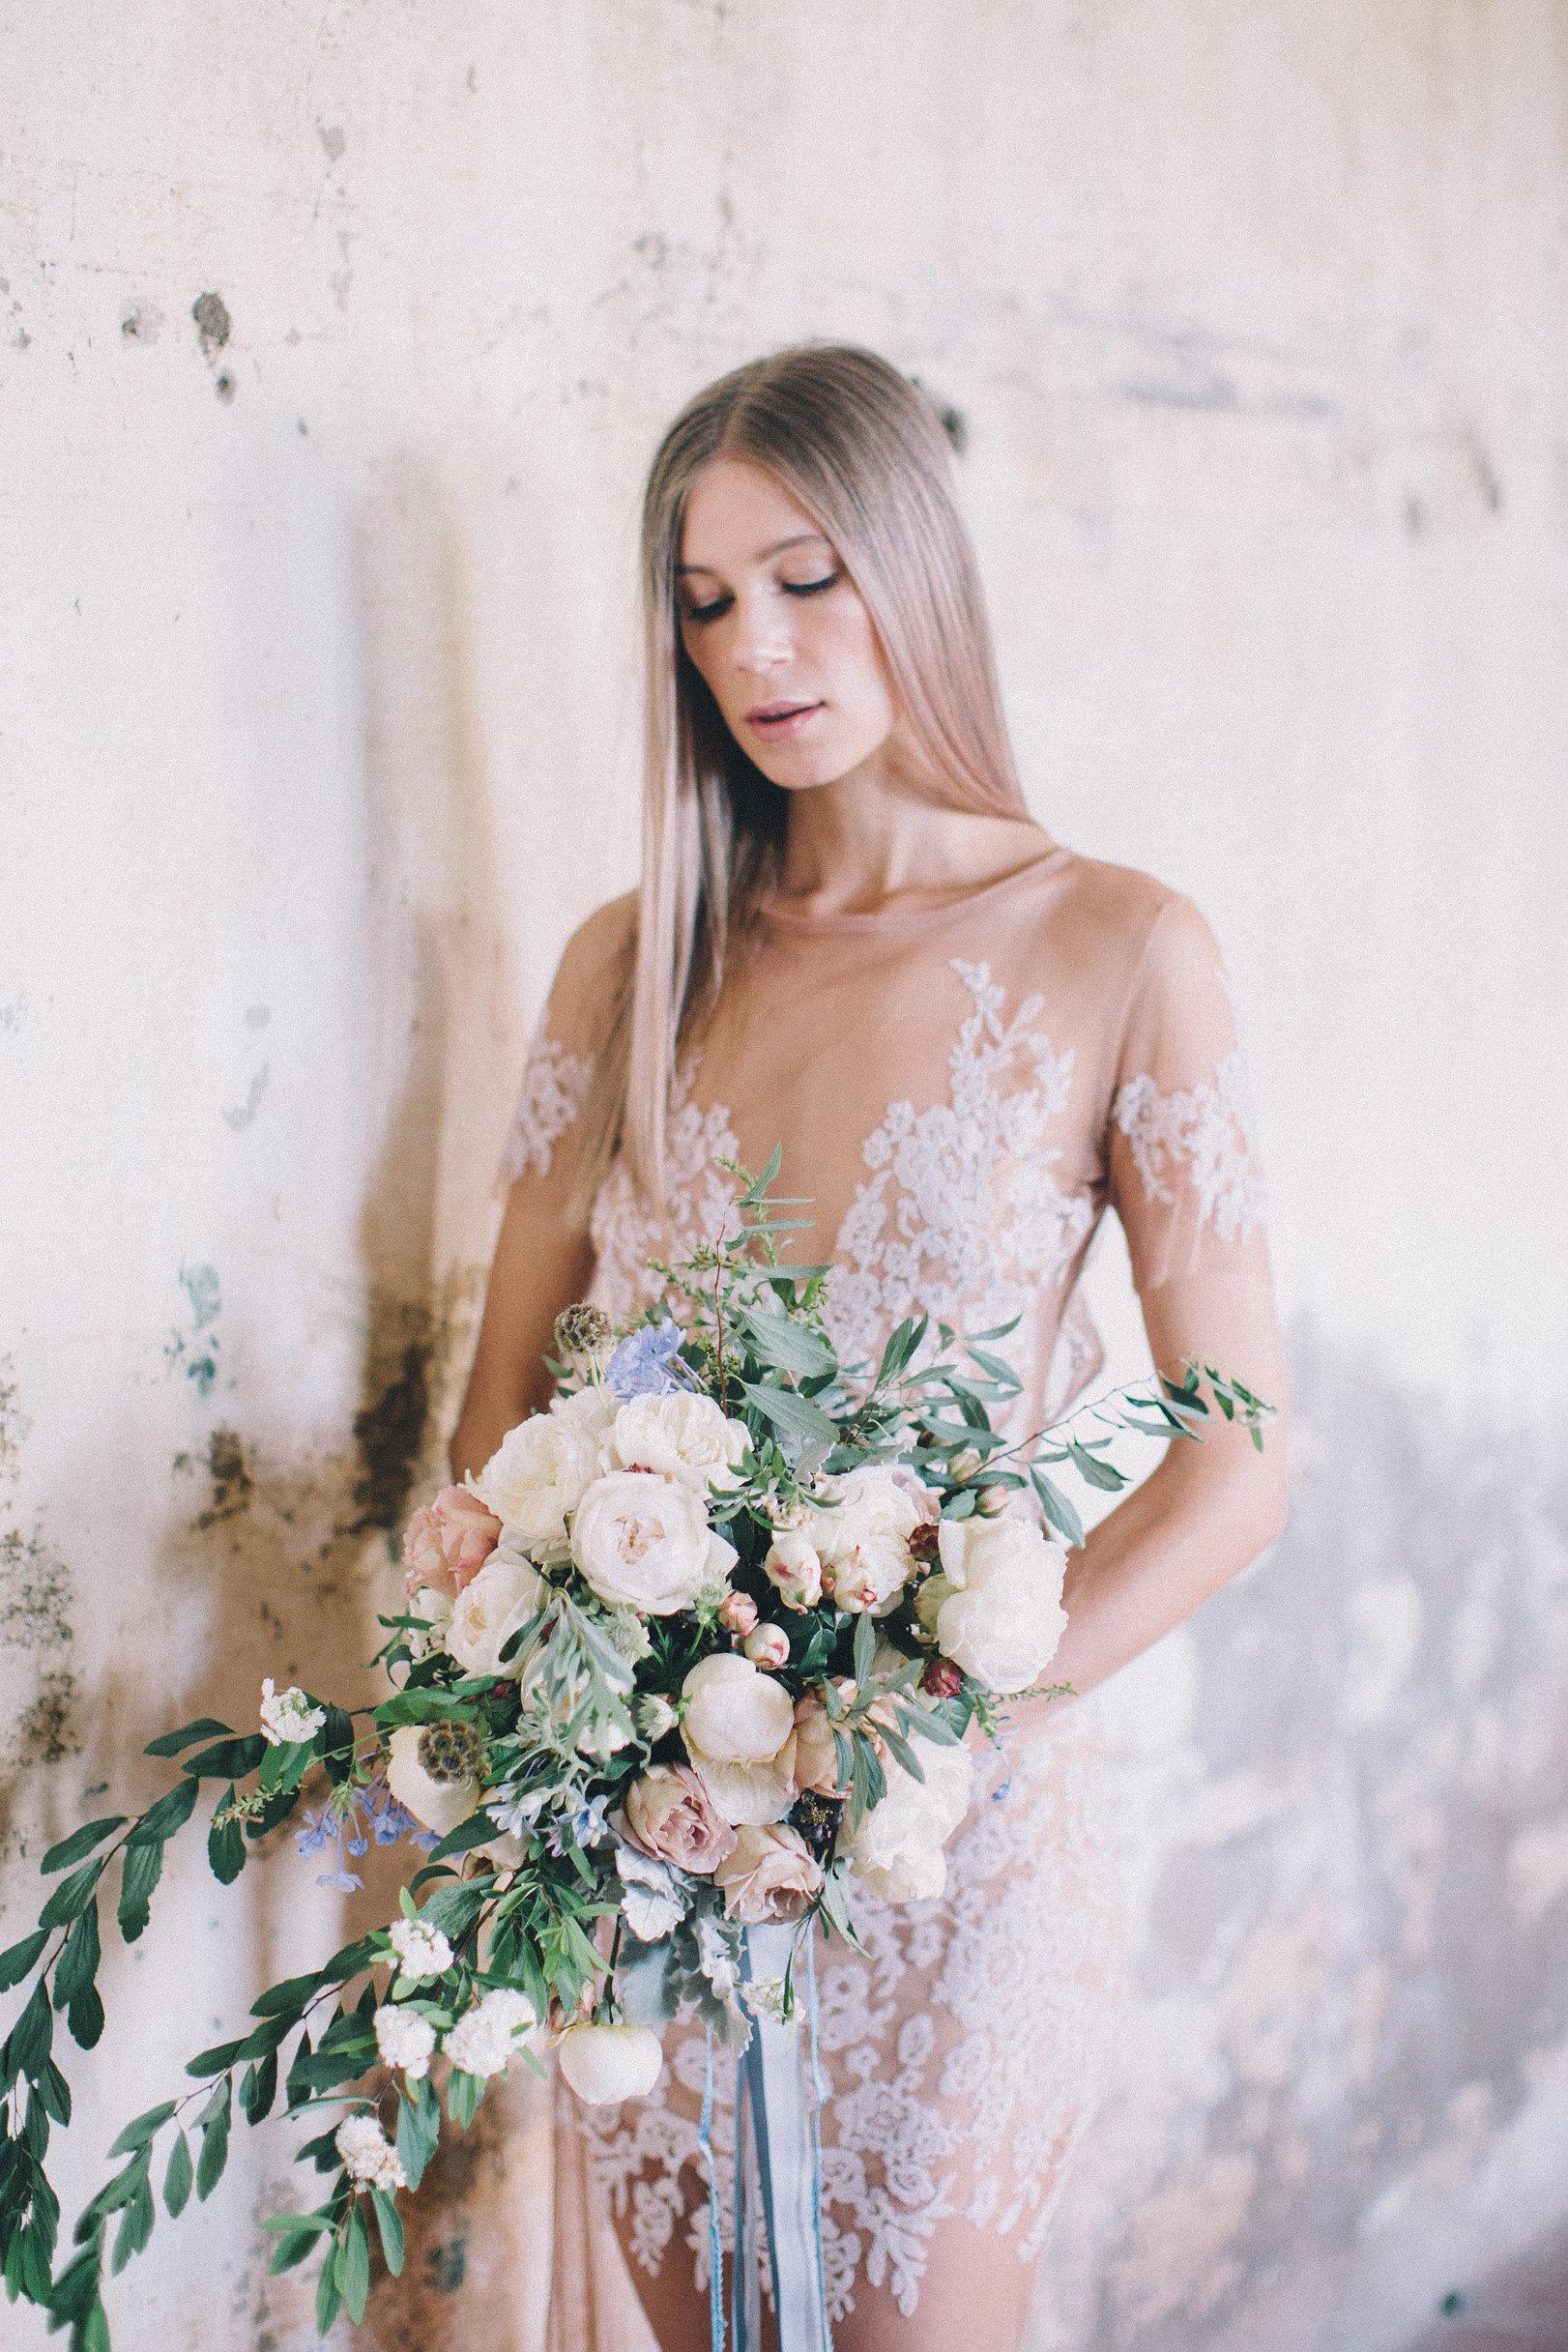 ETHEREAL BRIDE - TANIELLE JAI MUAROSE APPLE FLOWERSTHE EVENTS CO.